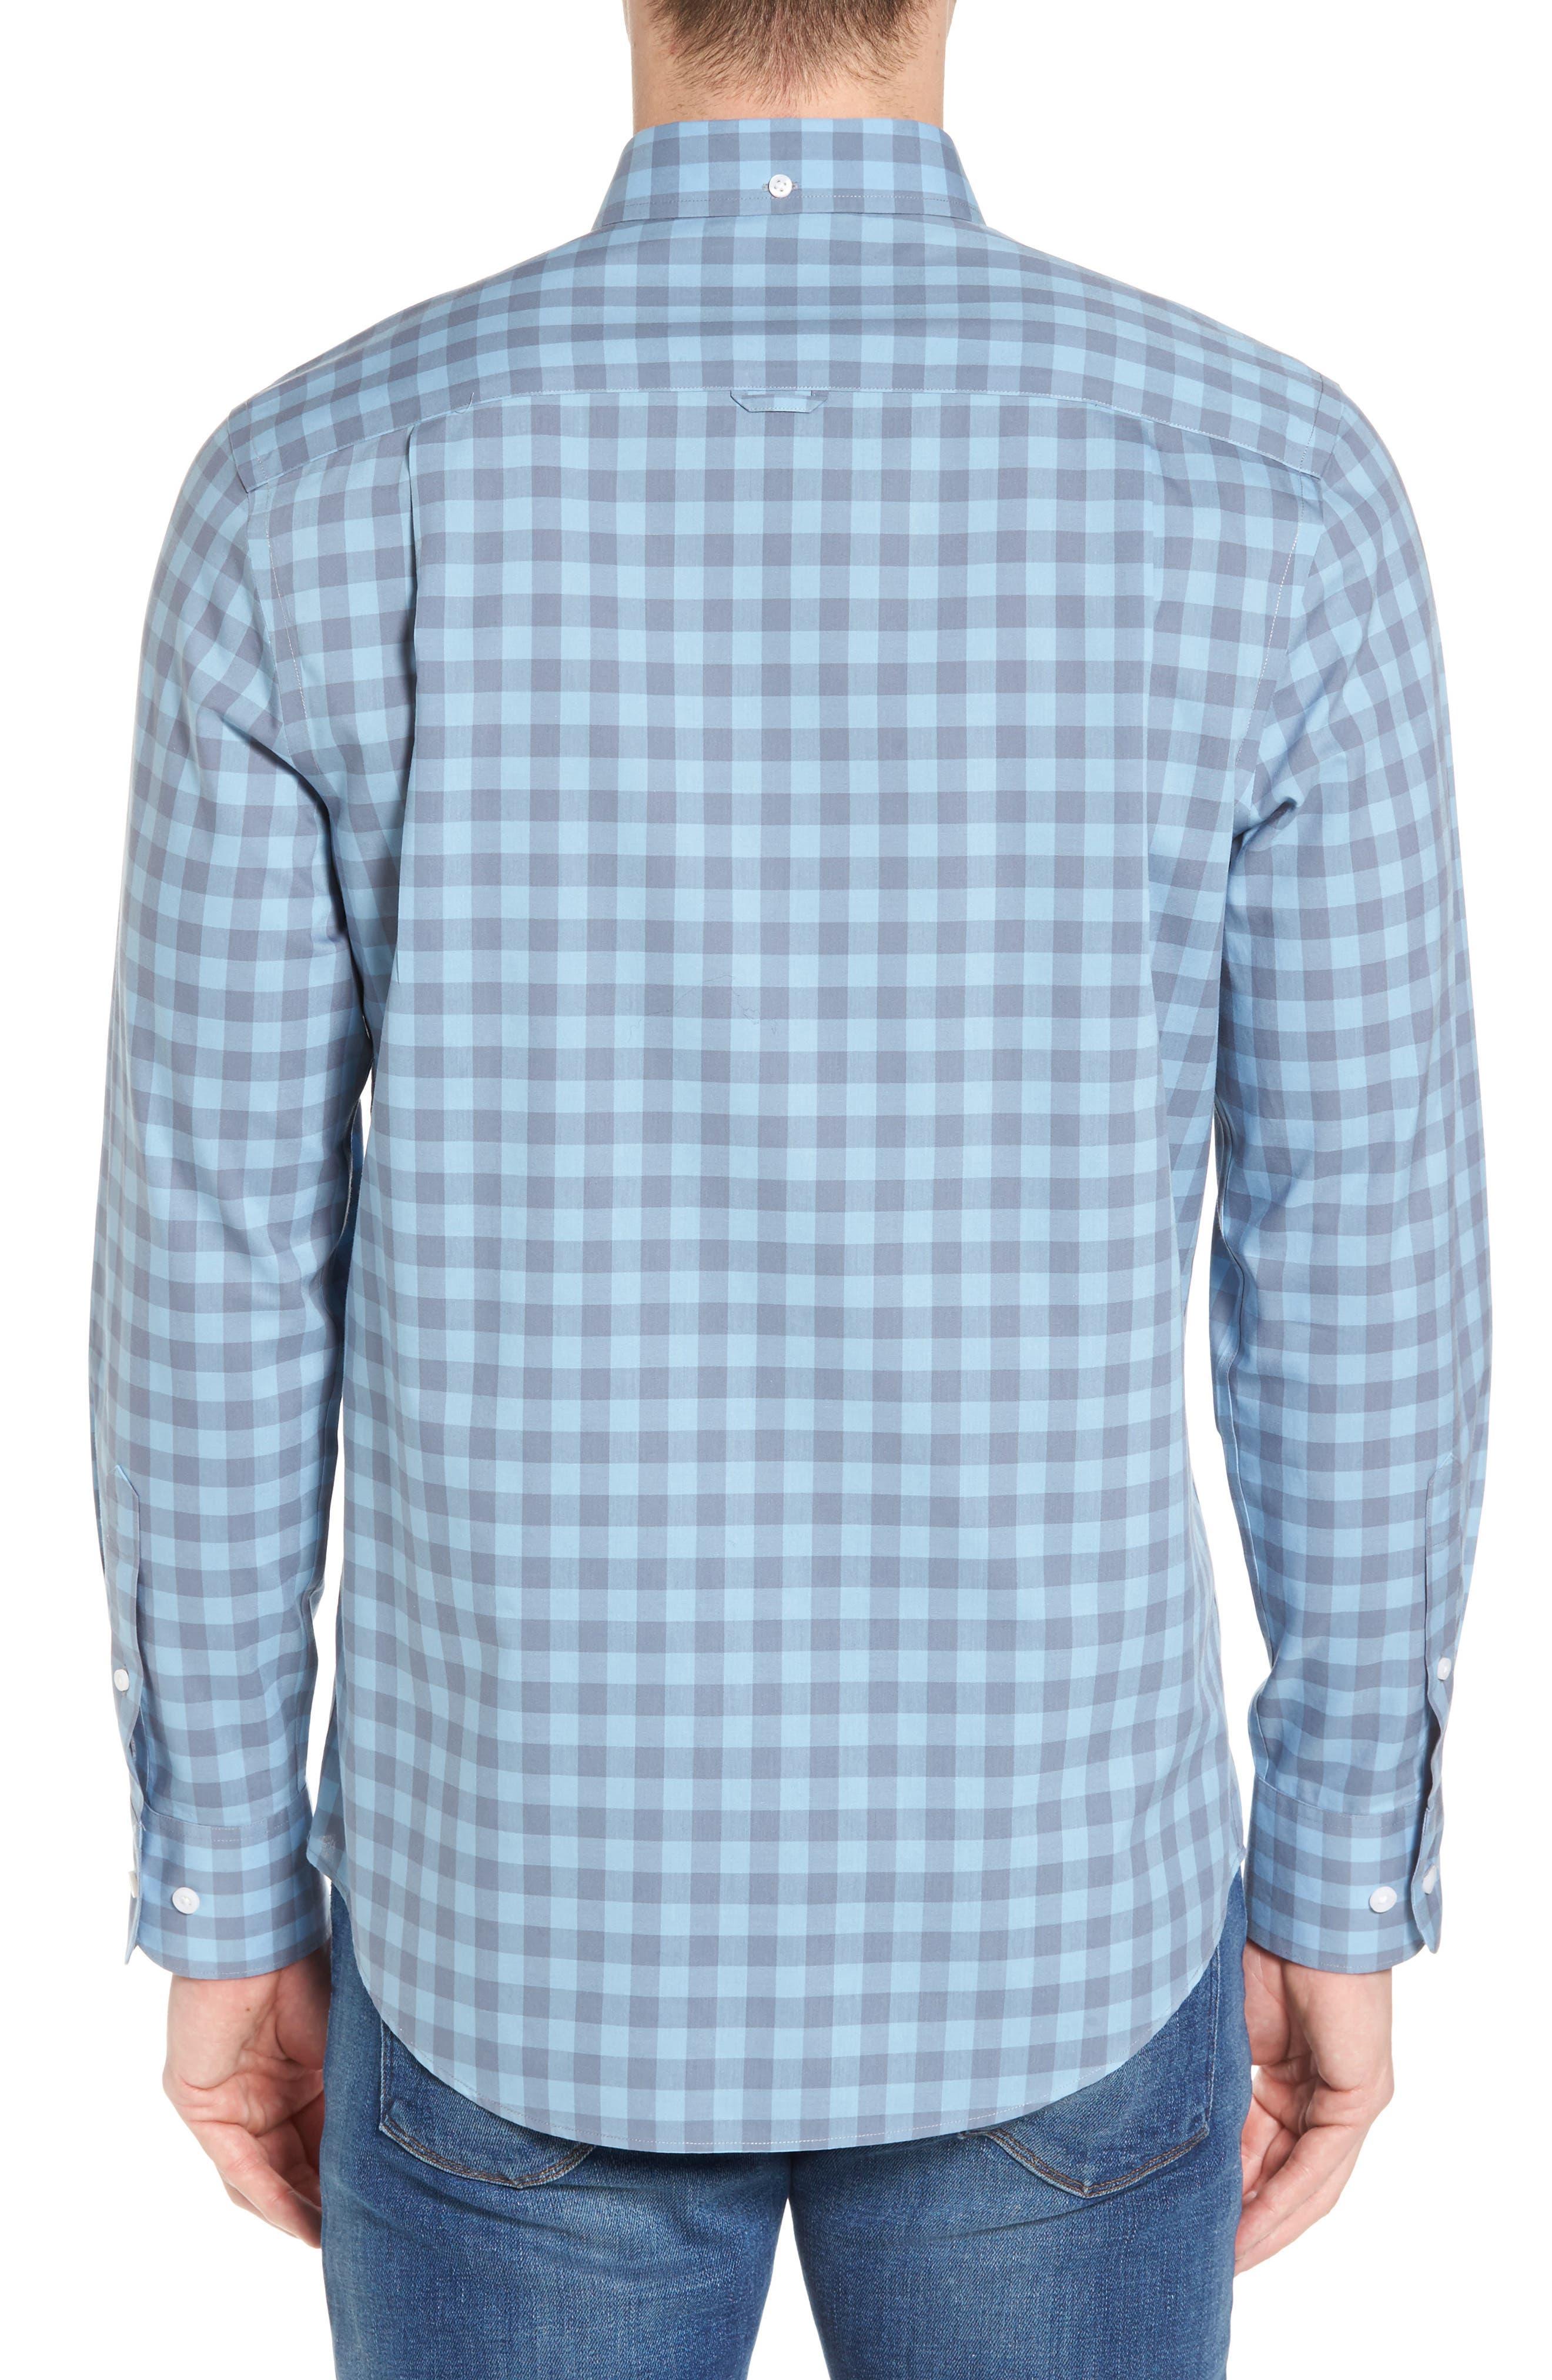 Regular Fit Gingham Sport Shirt,                             Alternate thumbnail 3, color,                             Blue Dusk Grey Gingham